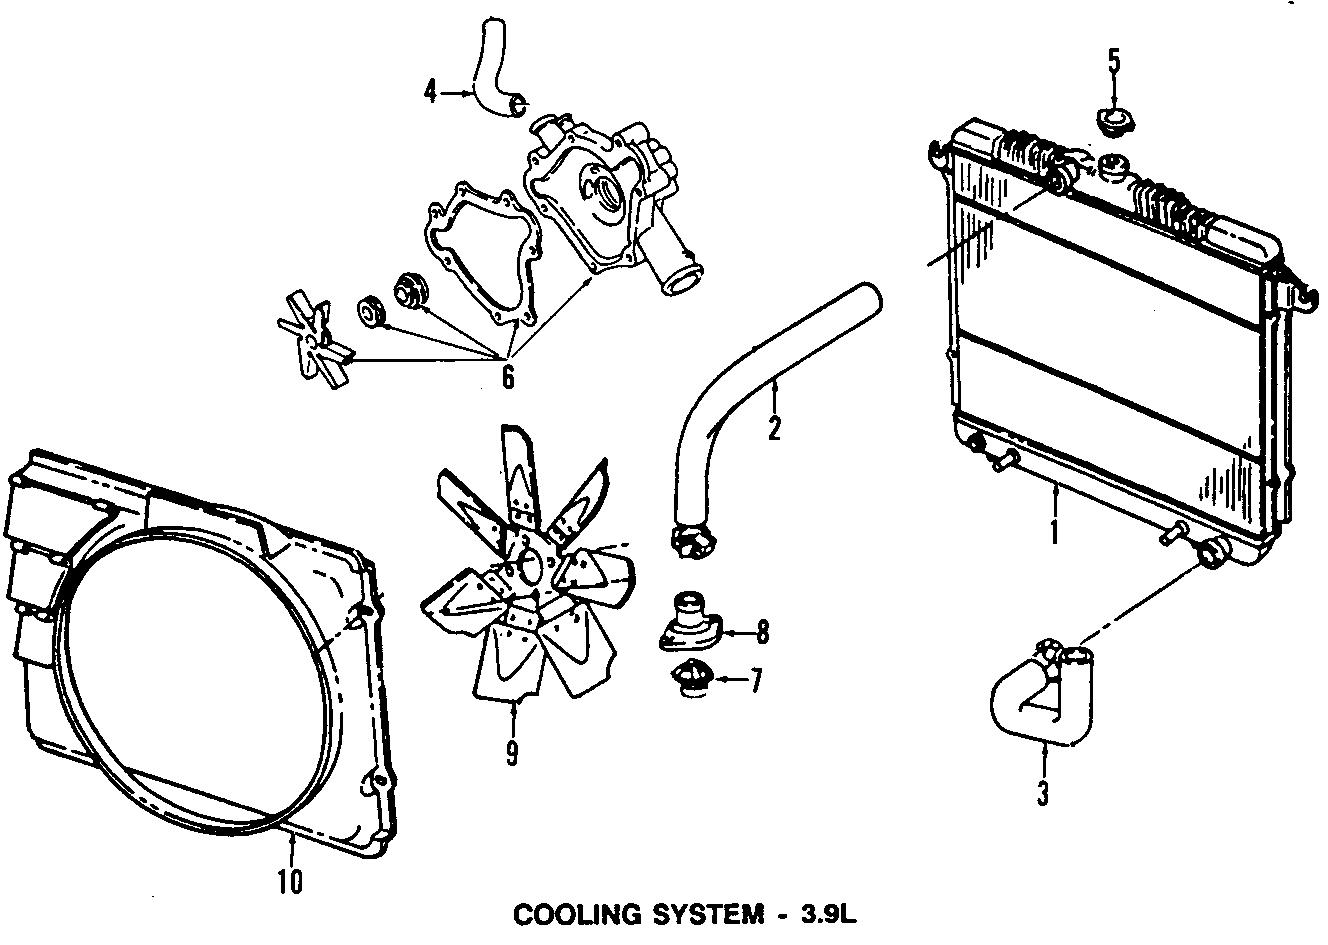 Dodge Dakota Upper hose. 3.9L; w/o Max Cool. 6 CYLINDER, W